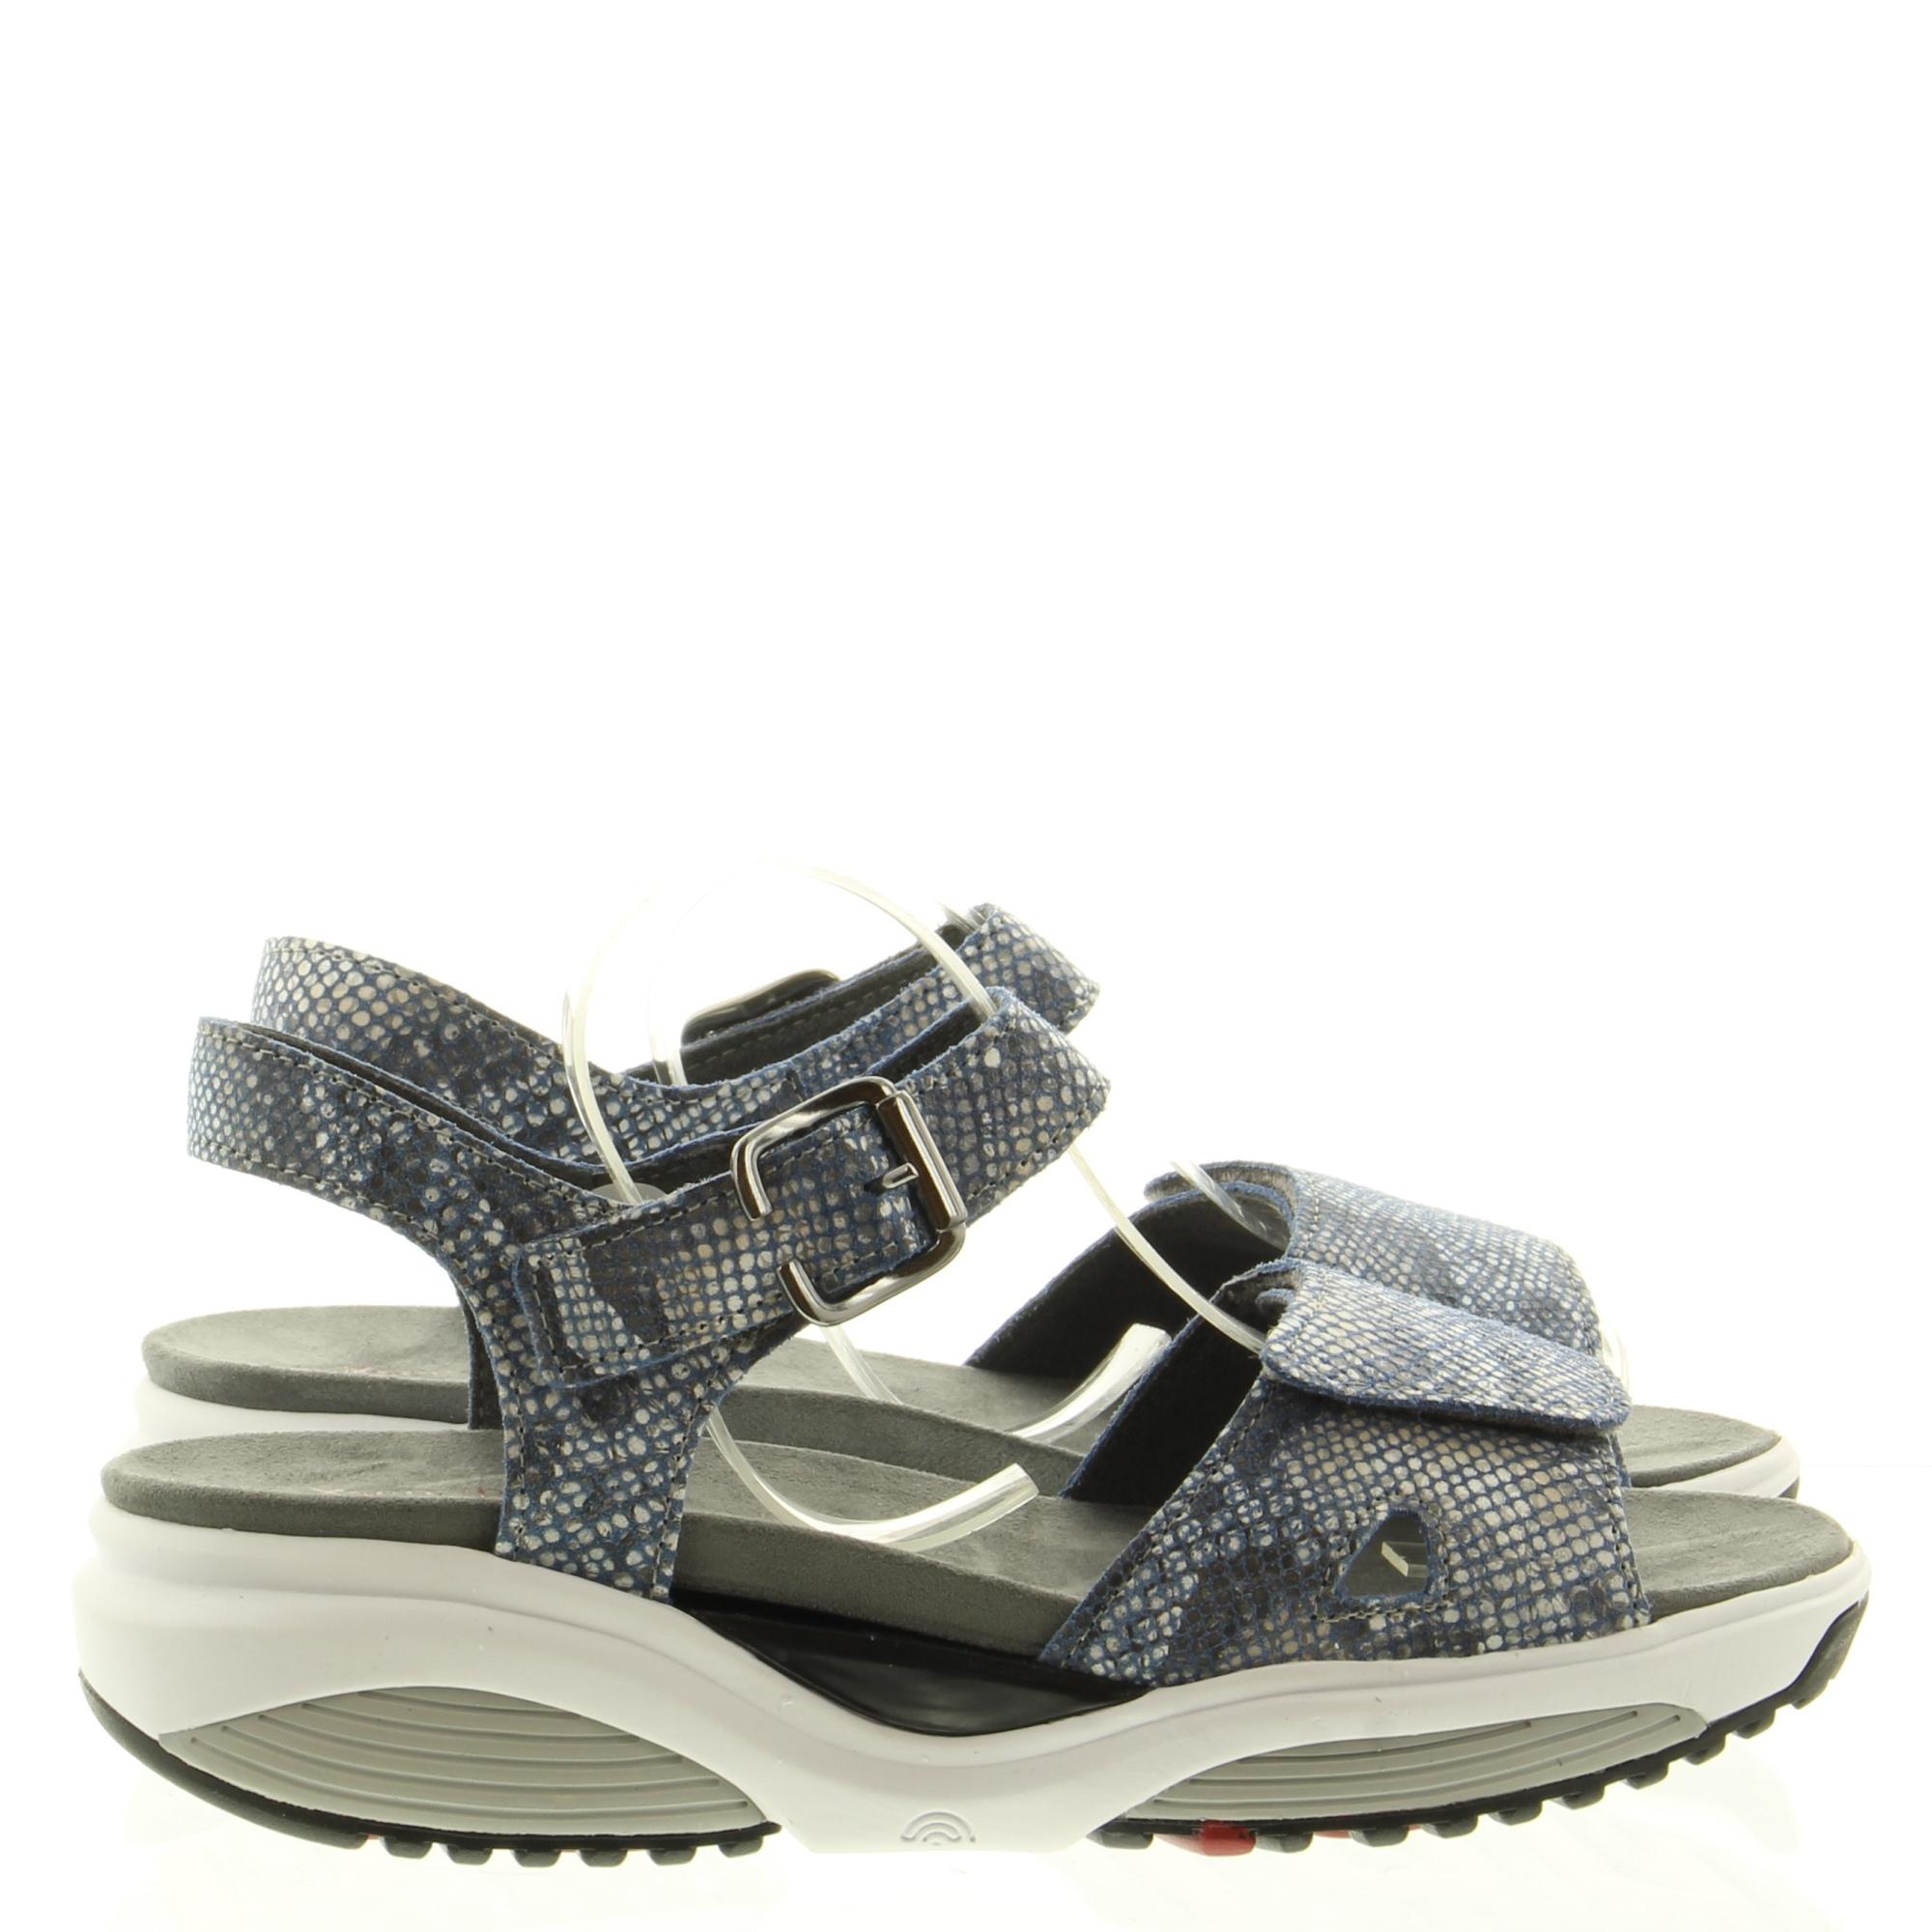 Xsensible 30304.5.266 Syros Jeans Snake